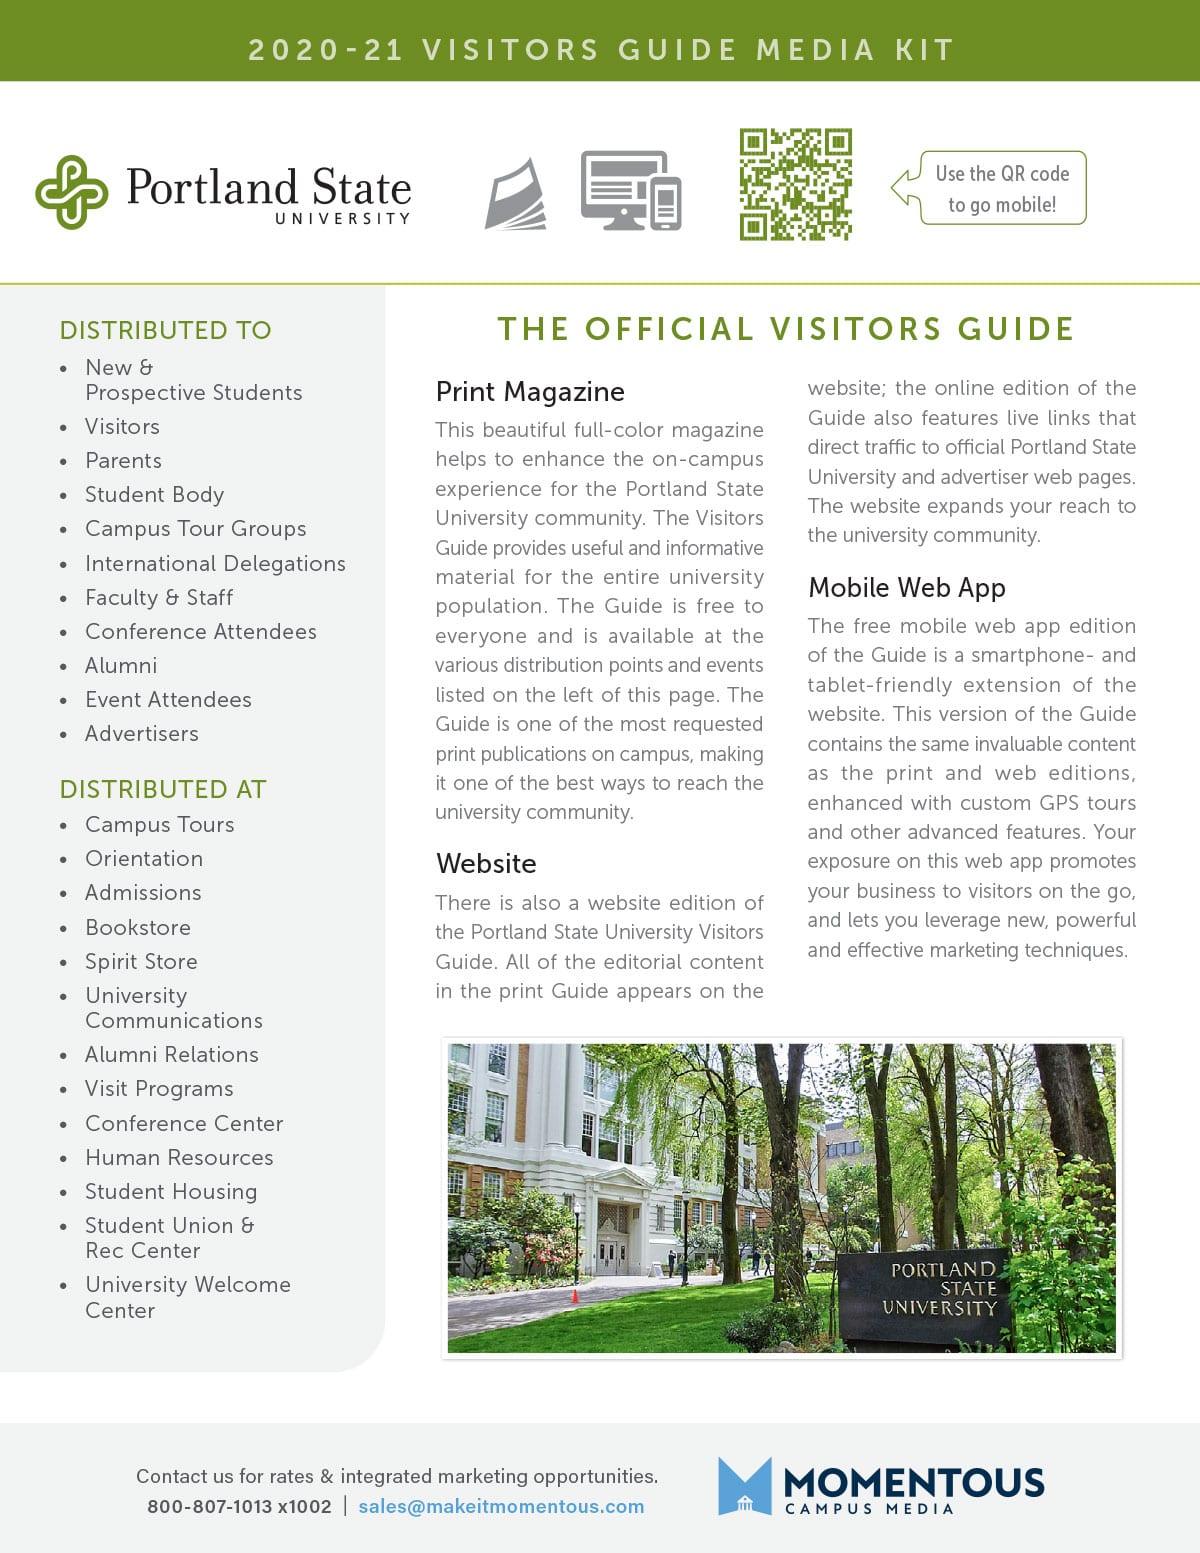 Media Kit Portland State University Visitor Guide